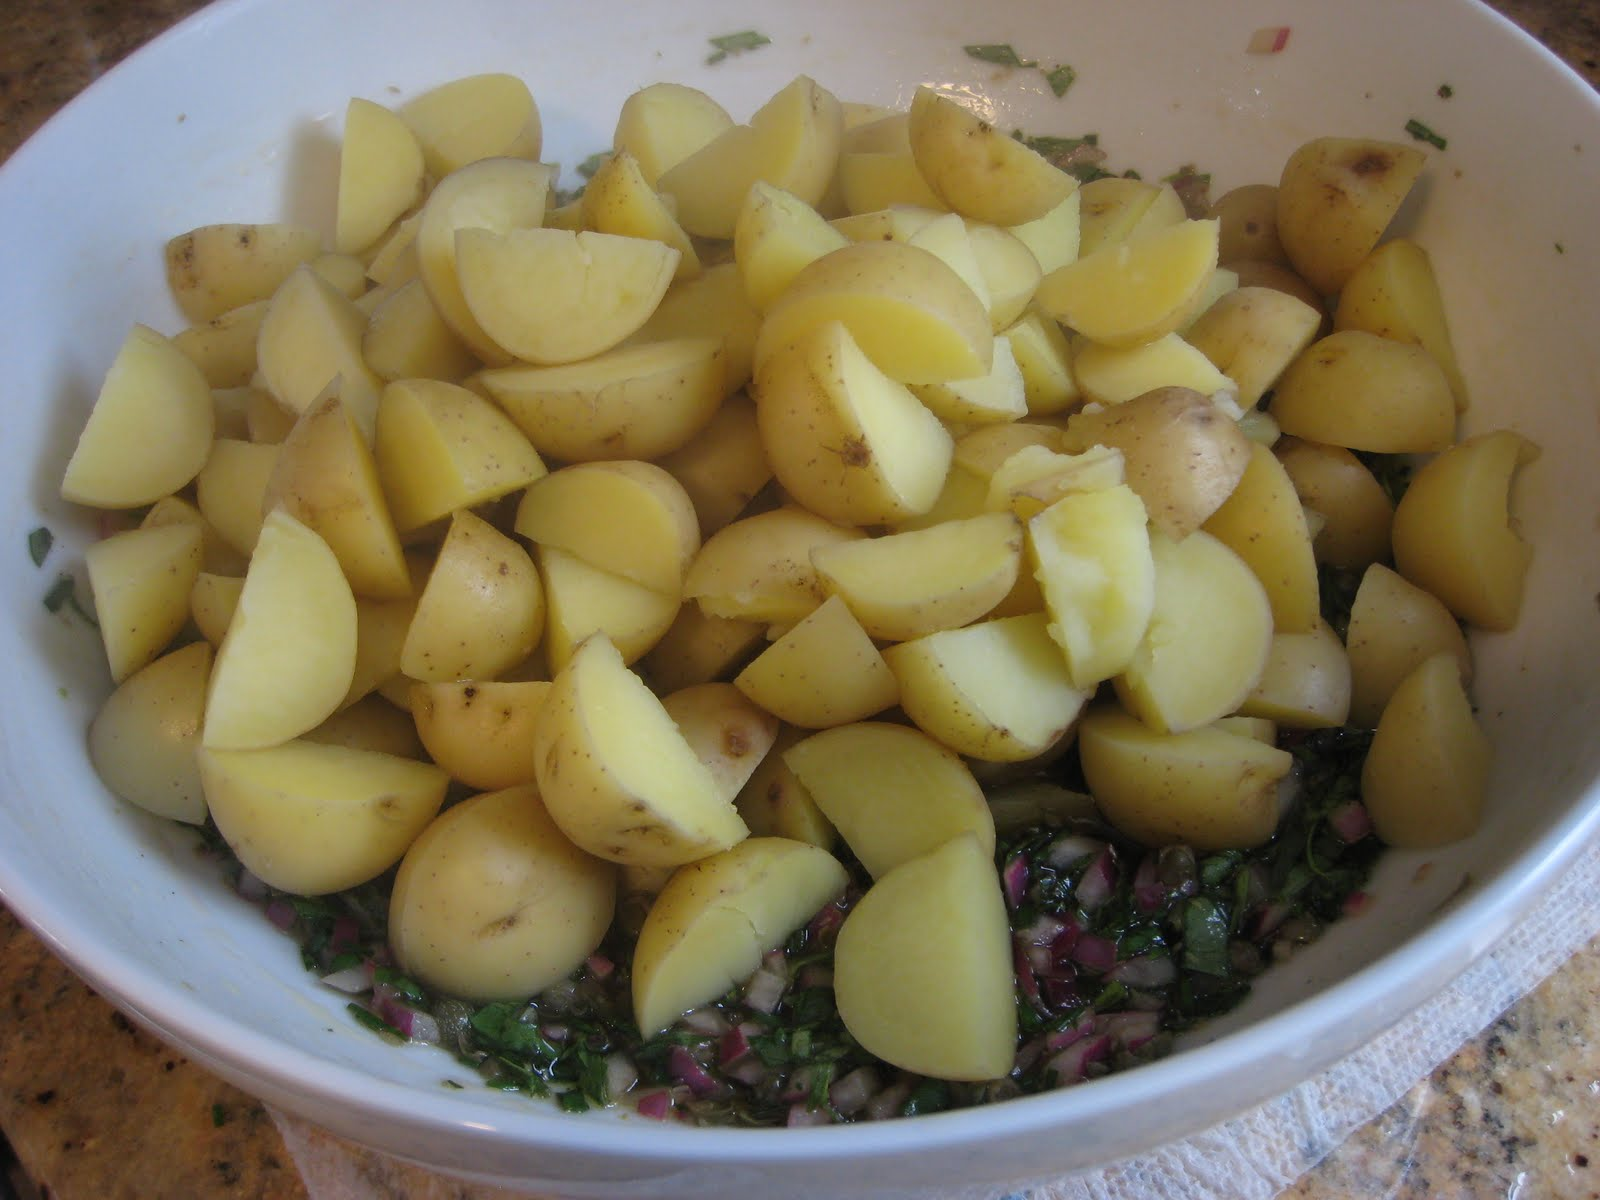 The Garlic Press: Herbed New Potato Salad